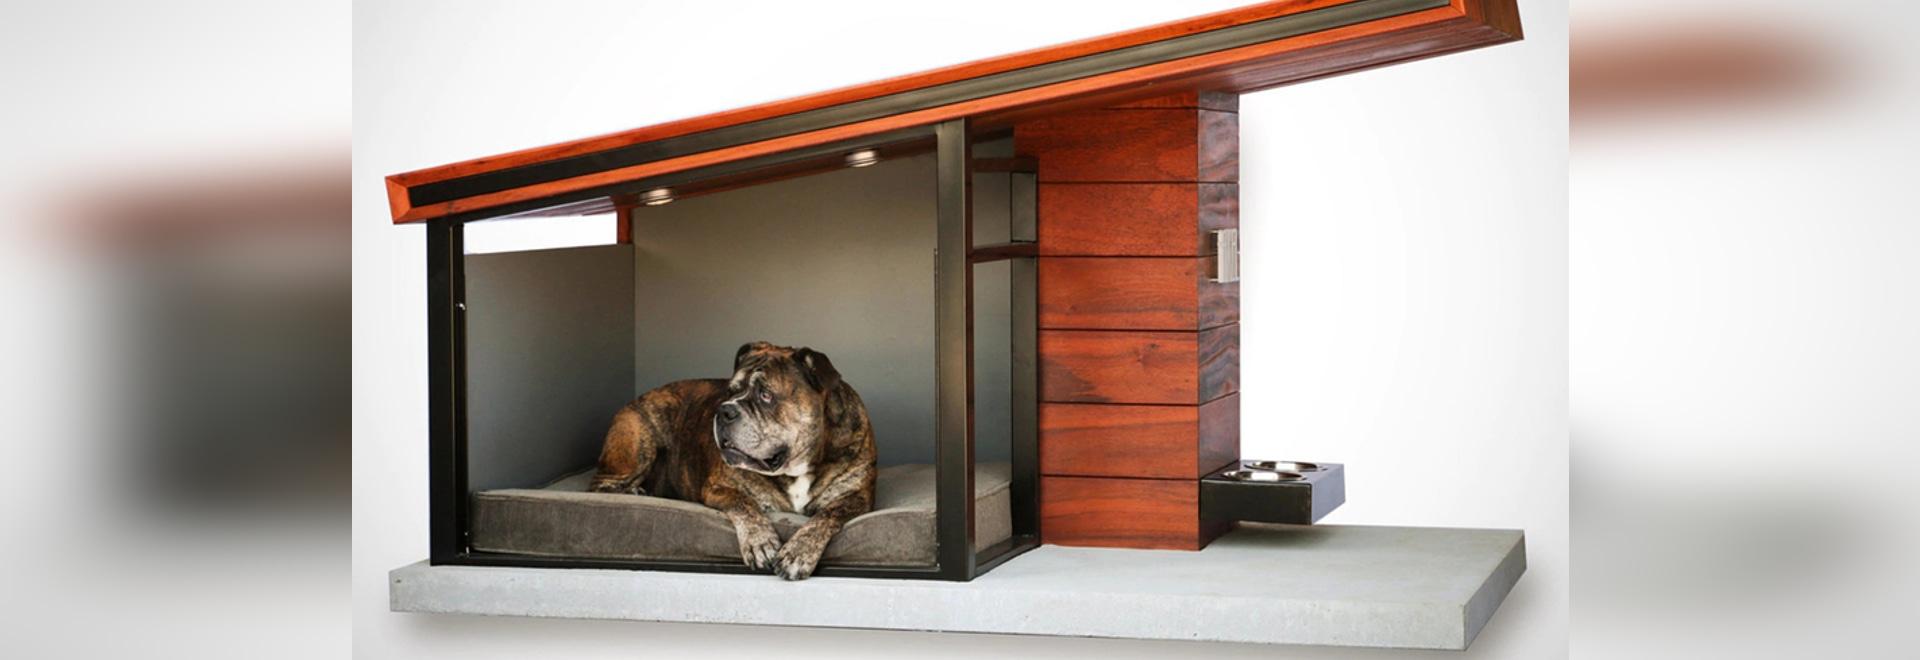 Rah Design mima a su perro con MDK9 Dog Haus